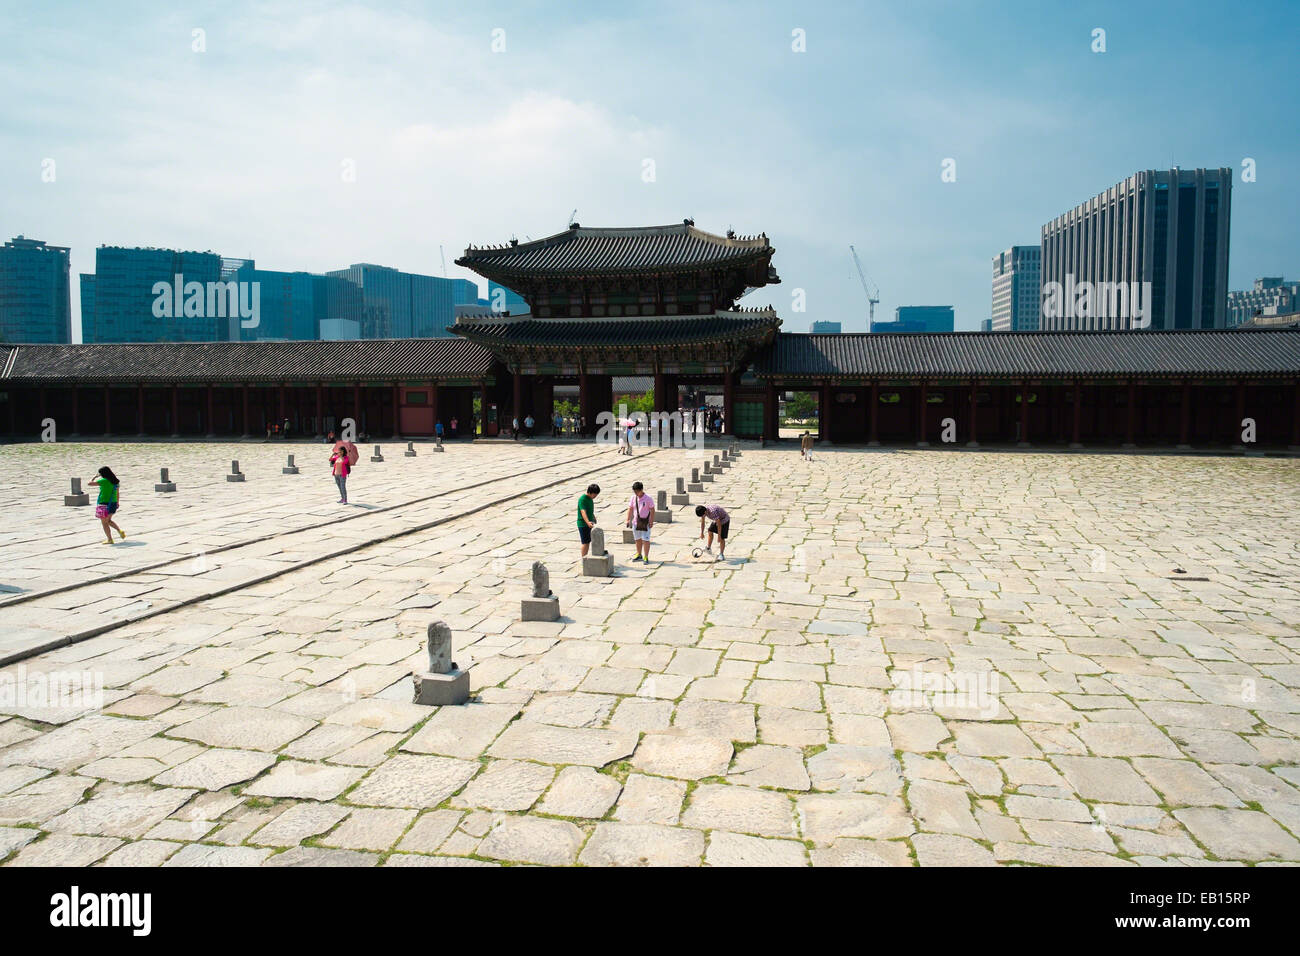 Entrance Gate to the Gyeongbokgung Palace, Seoul, South Korea - Stock Image